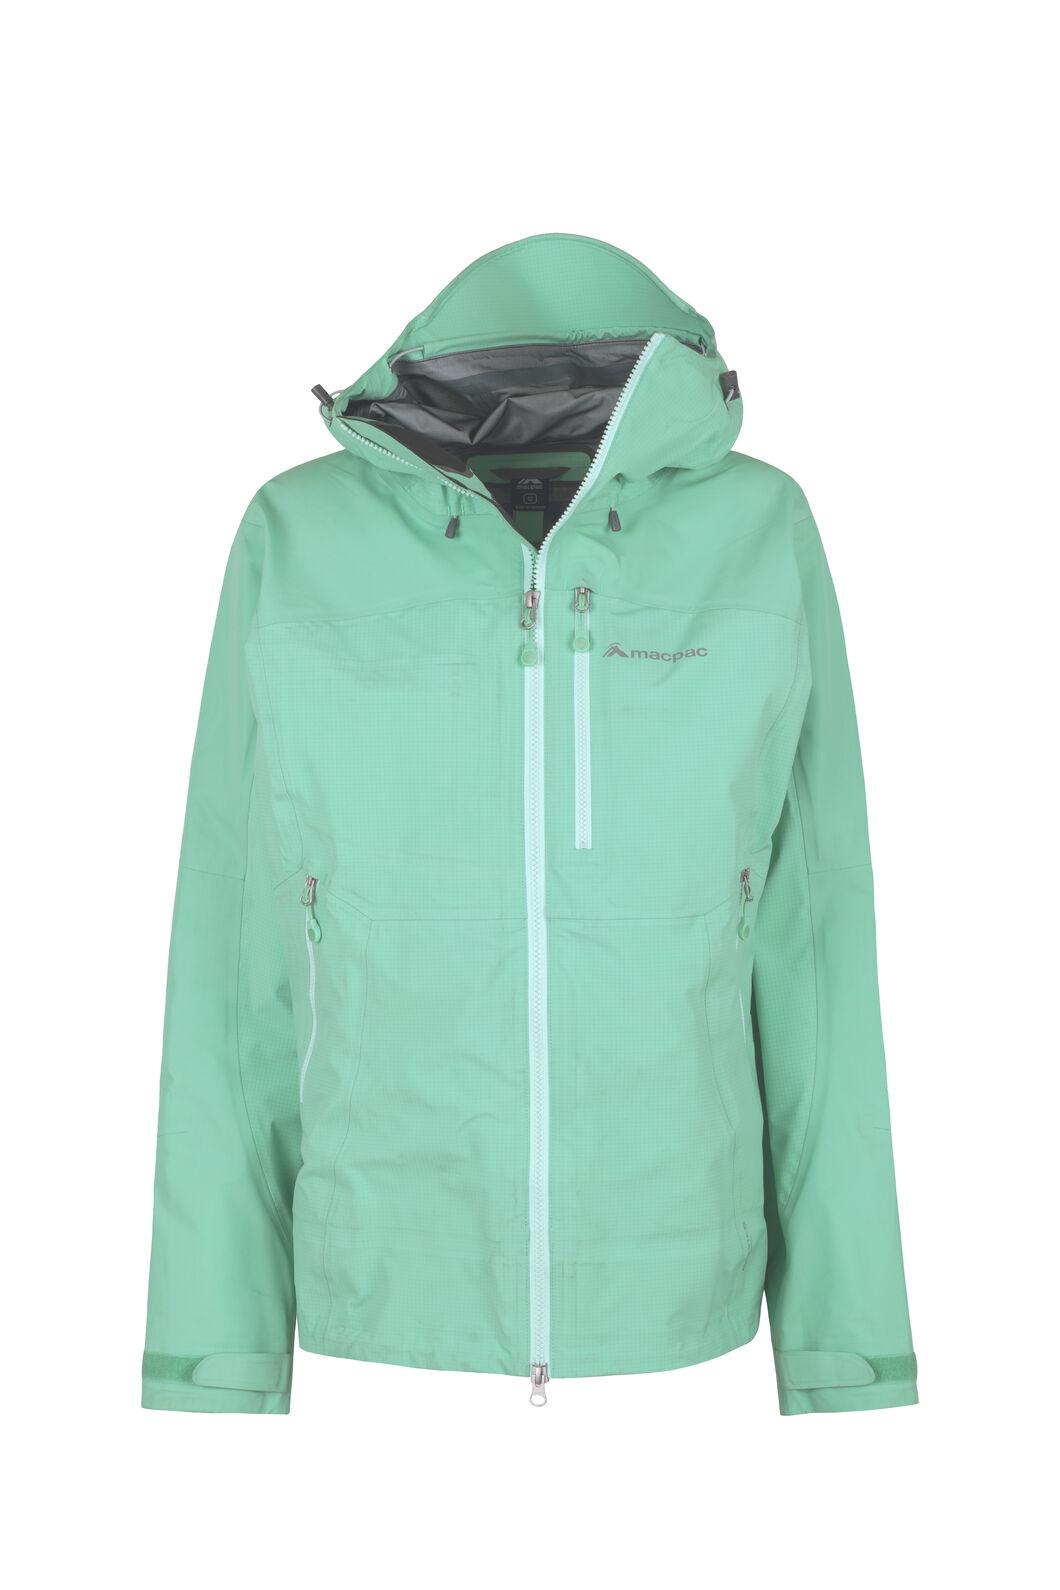 Macpac Lightweight Prophet Pertex® Rain Jacket - Women's, Turquoise, hi-res